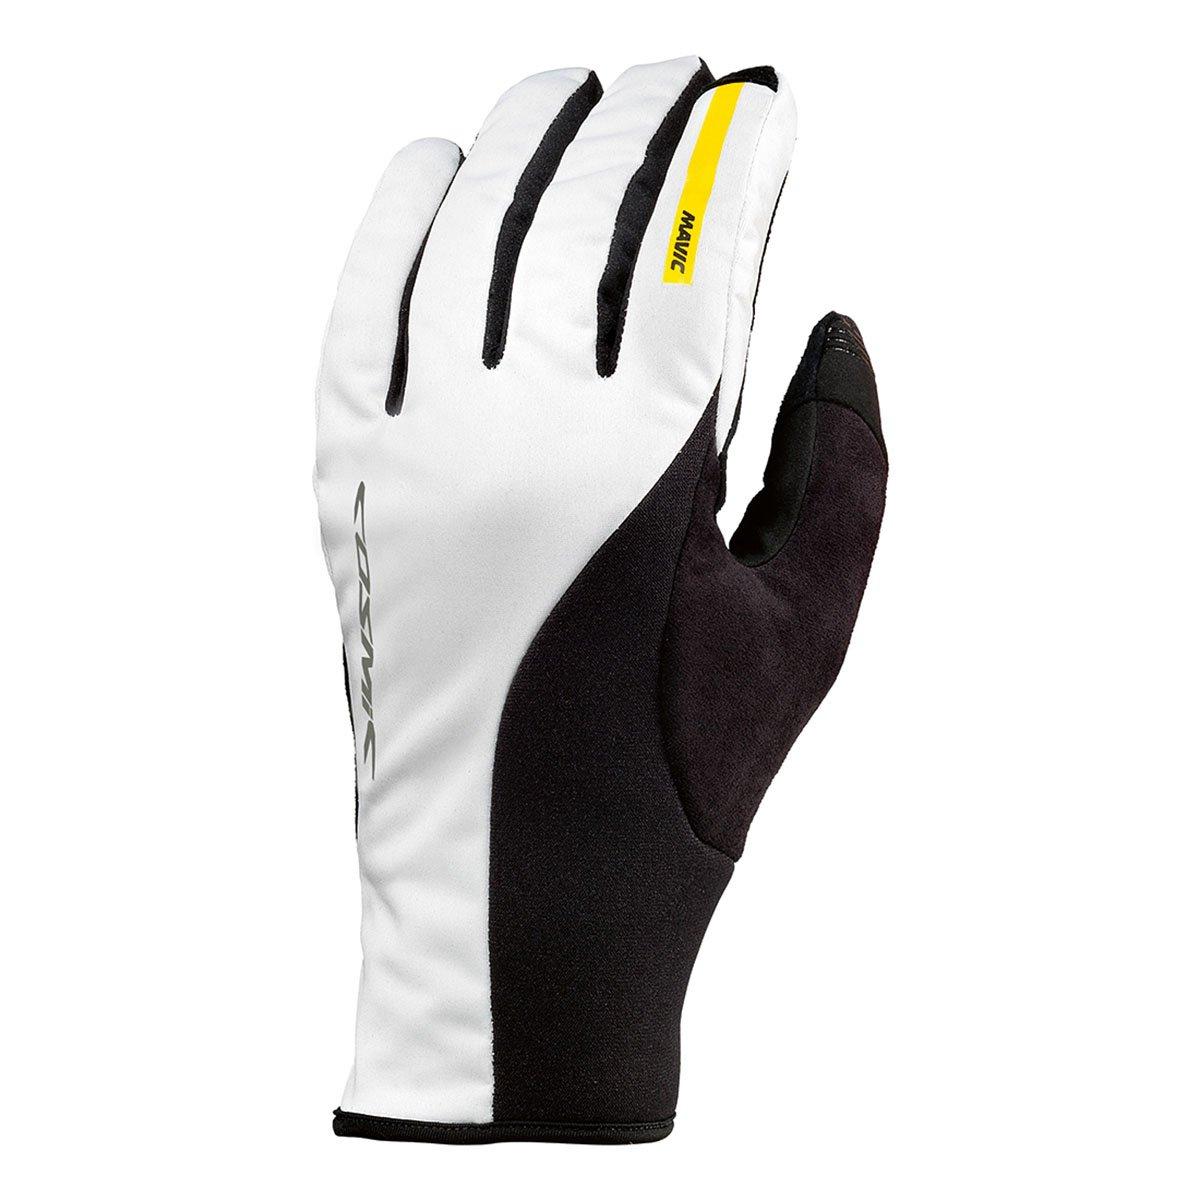 Mavic Cosmic Pro Wind Gloves B011KWCCHU  ブラック/ホワイト X-Large